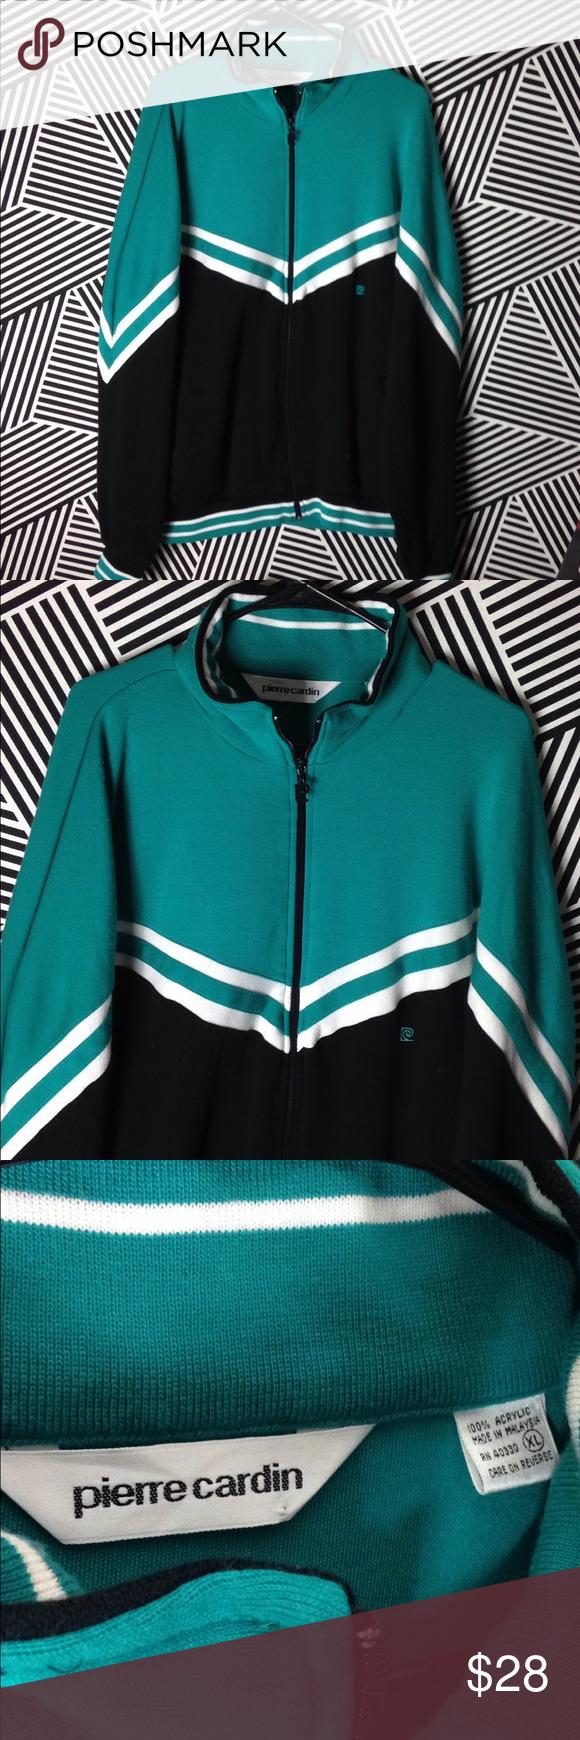 Vintage 70s Pierre Cardin Track Jacket Sweatshirt Track Jackets Vintage Nike Pierre Cardin